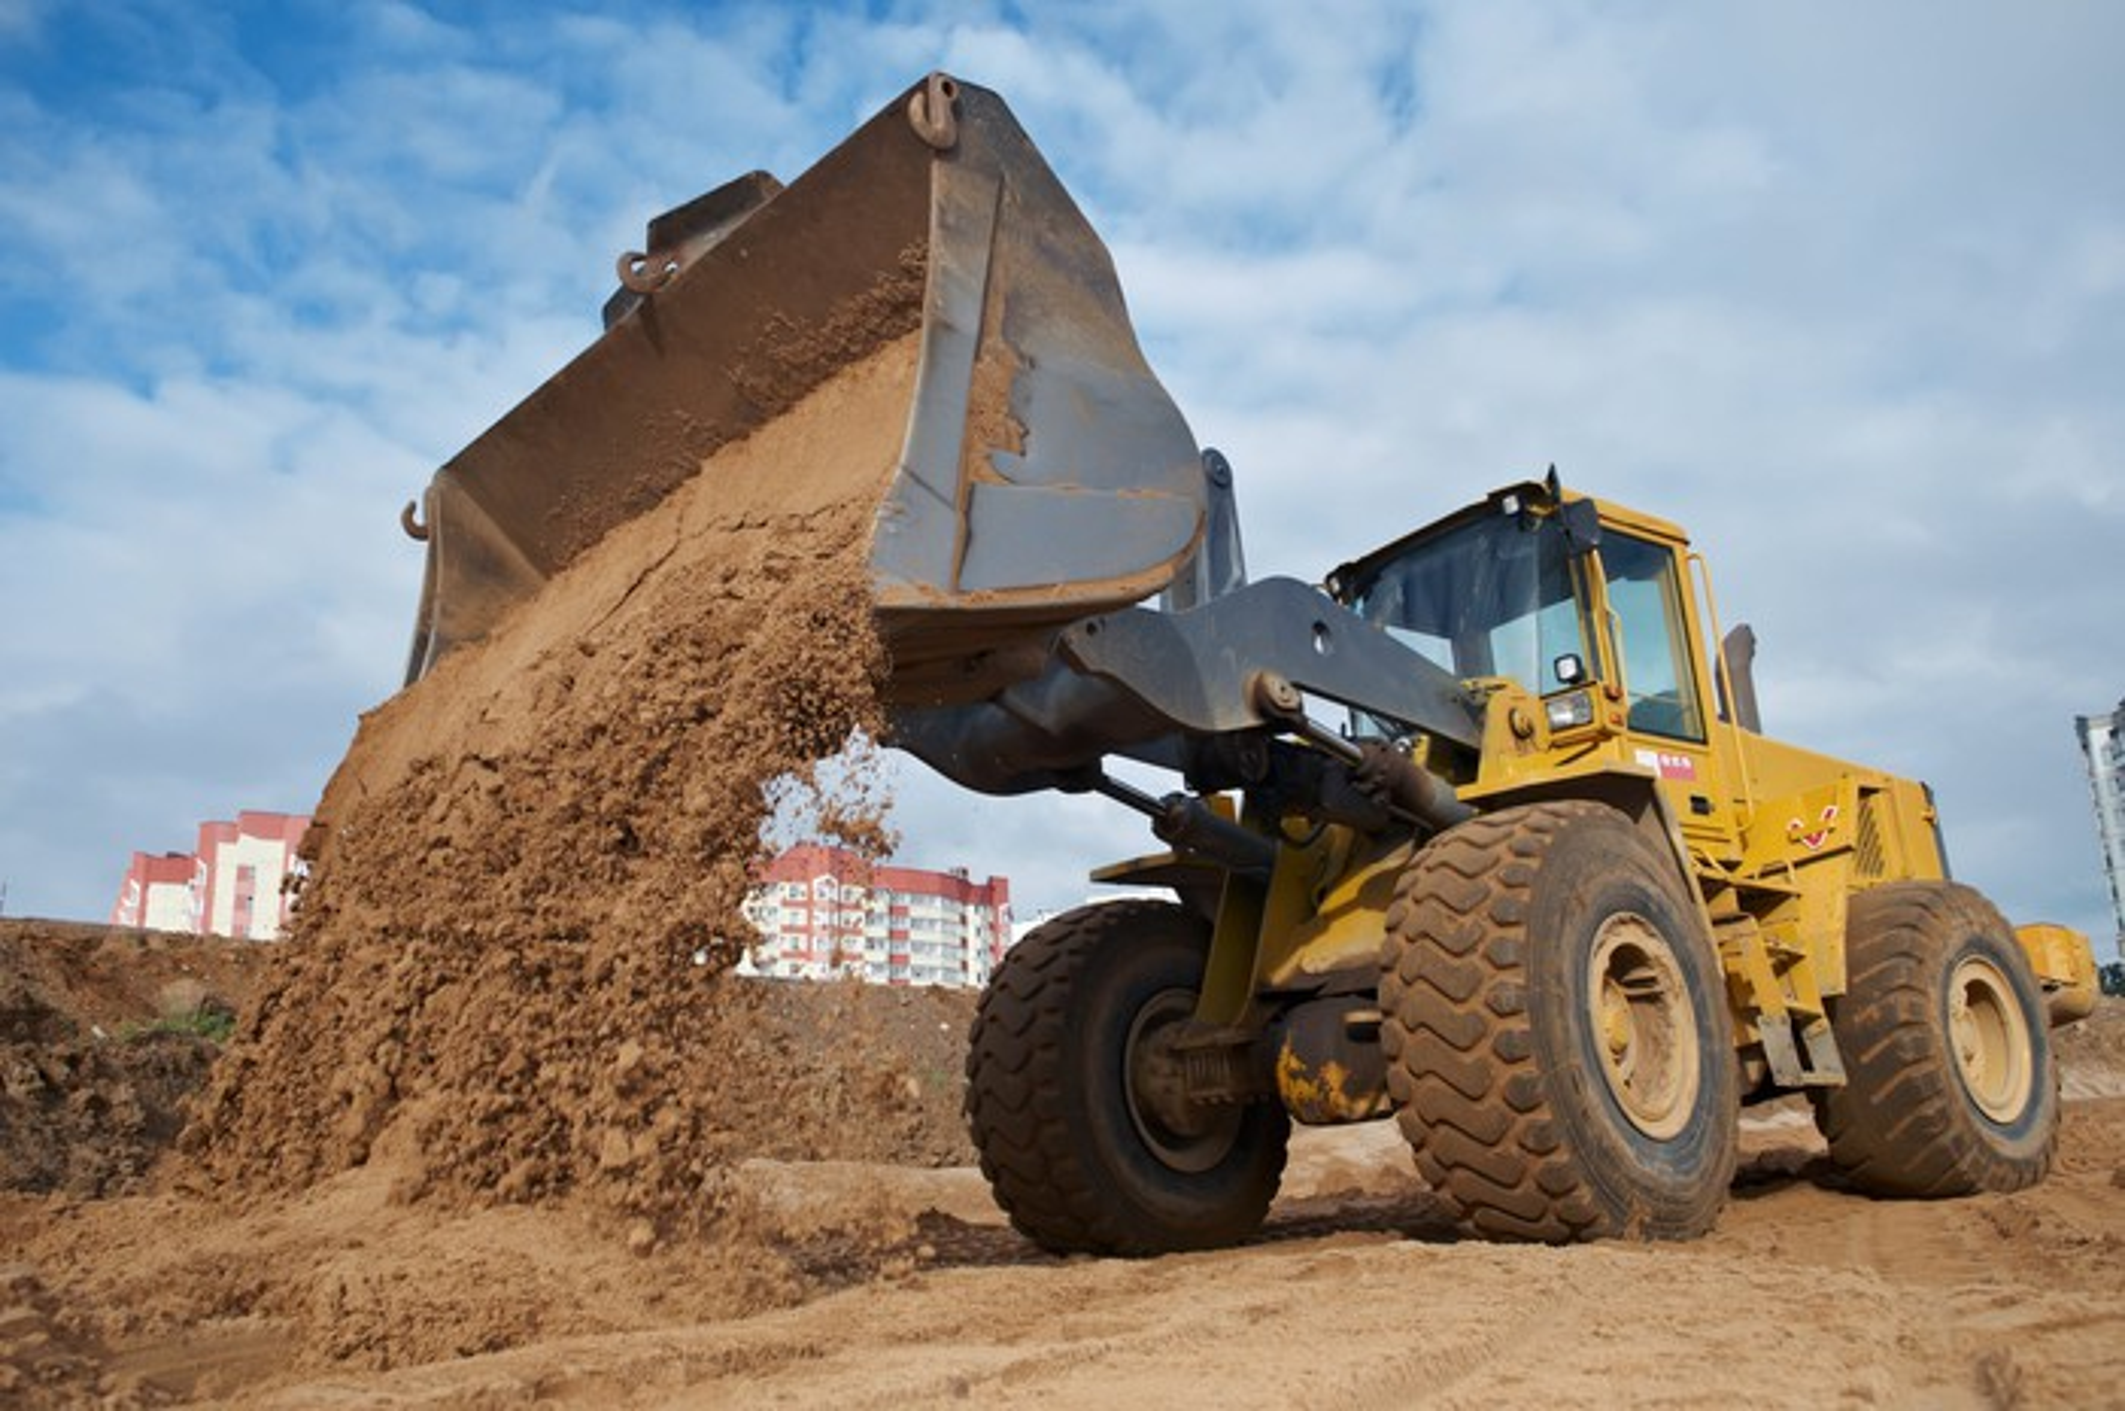 Front loader dumping a pile of sand